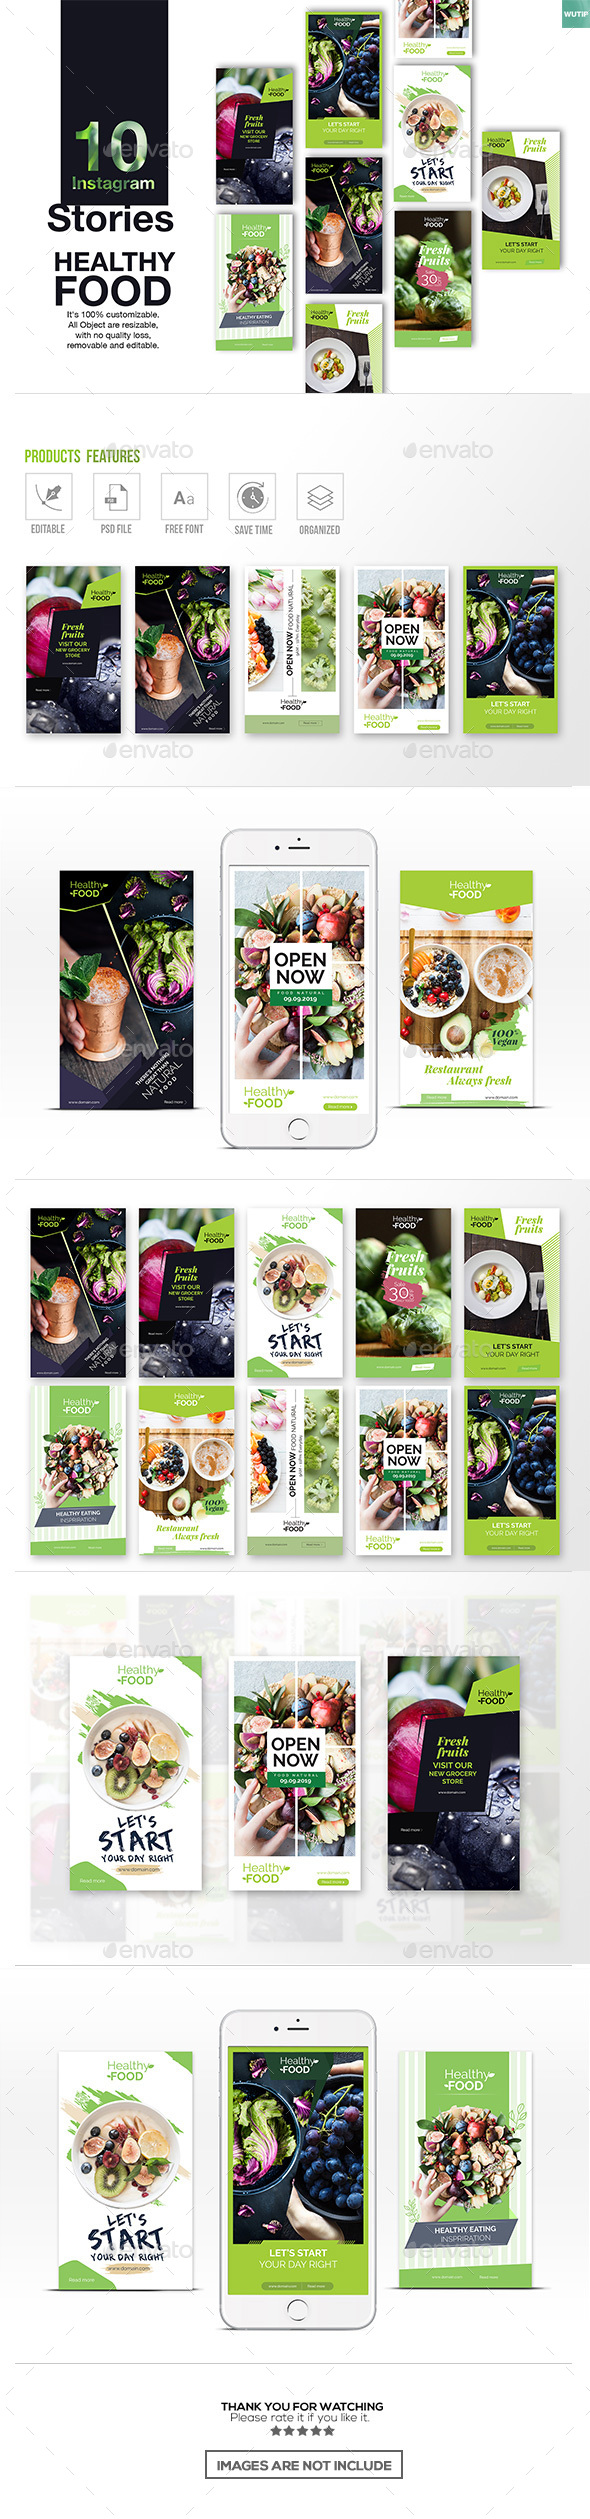 GraphicRiver 10 Instagram Stories Healthy Food 21010981